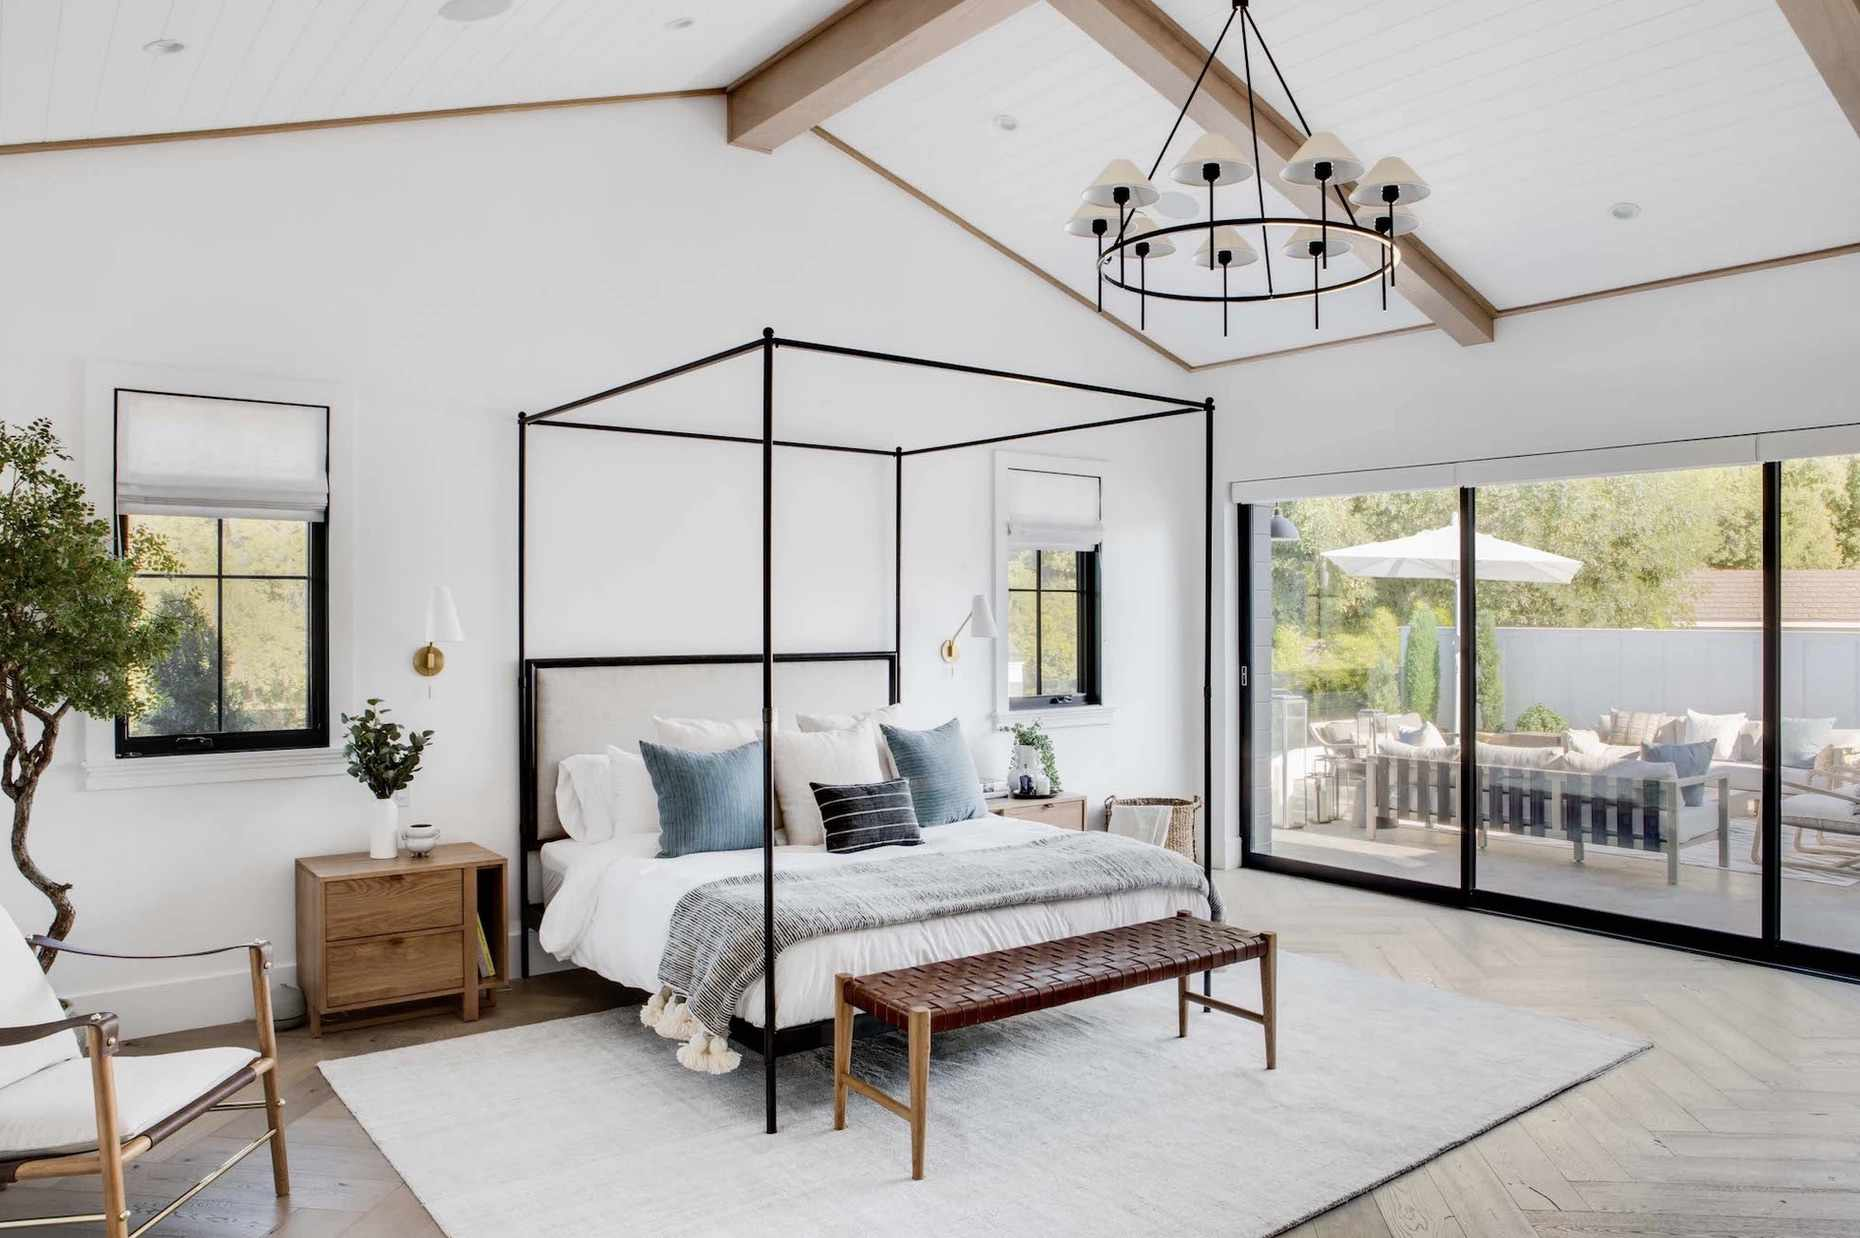 modern bedroom with black metal four poster bed frame, bonsai tree, plenty of natural lighting